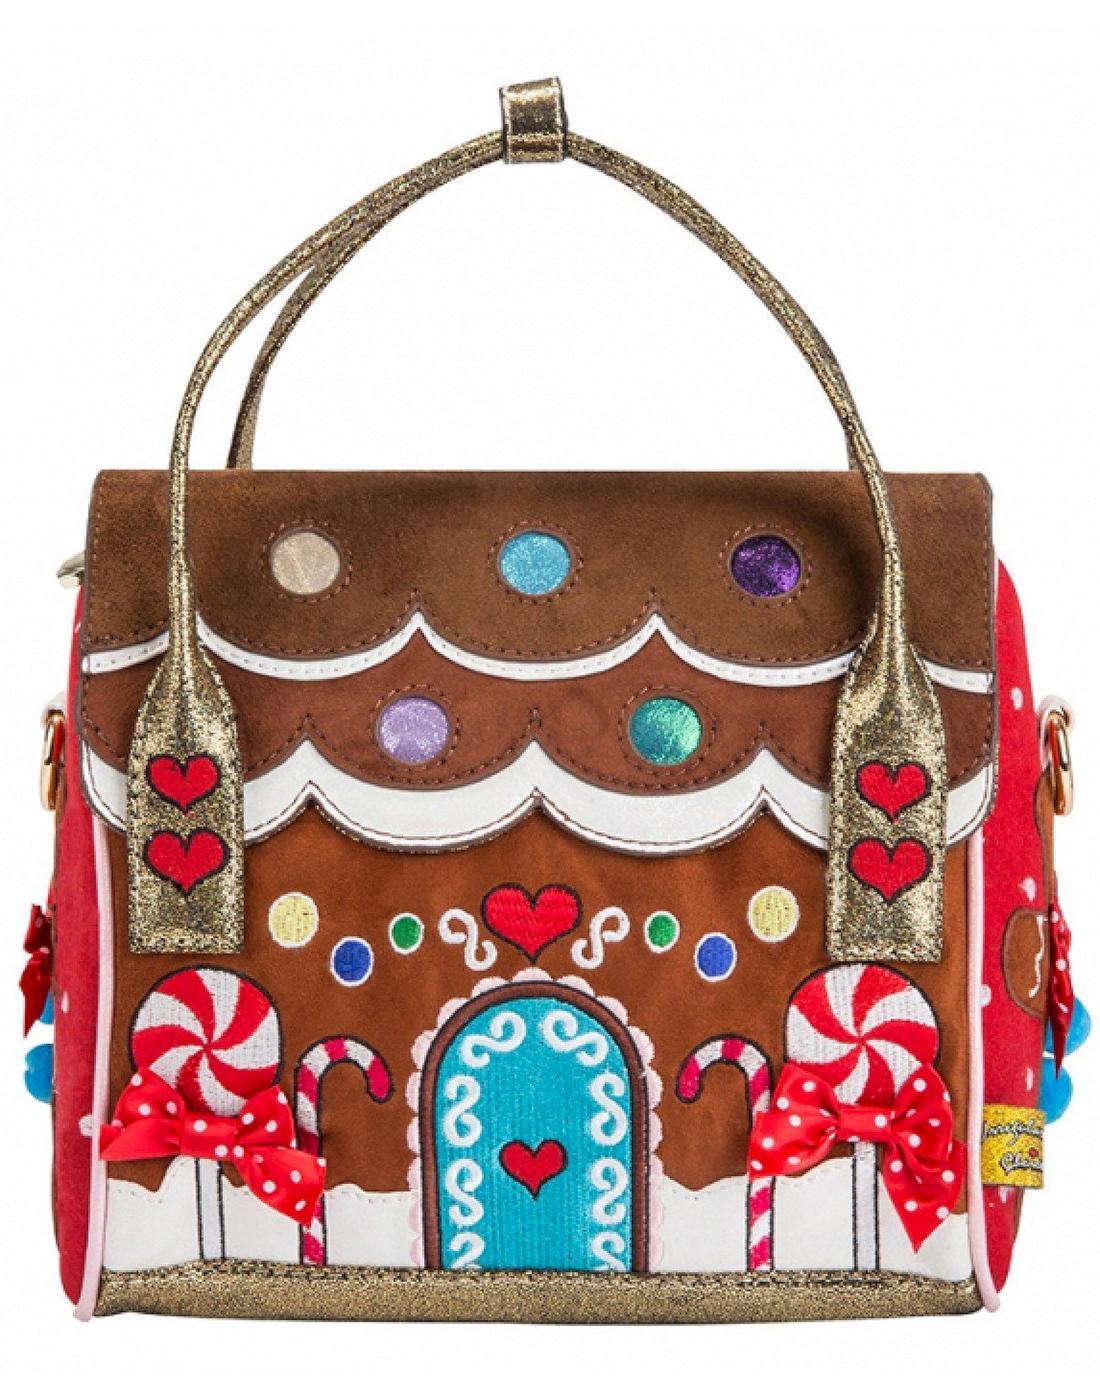 House Party Irregular Choice Gingerbread Handbag